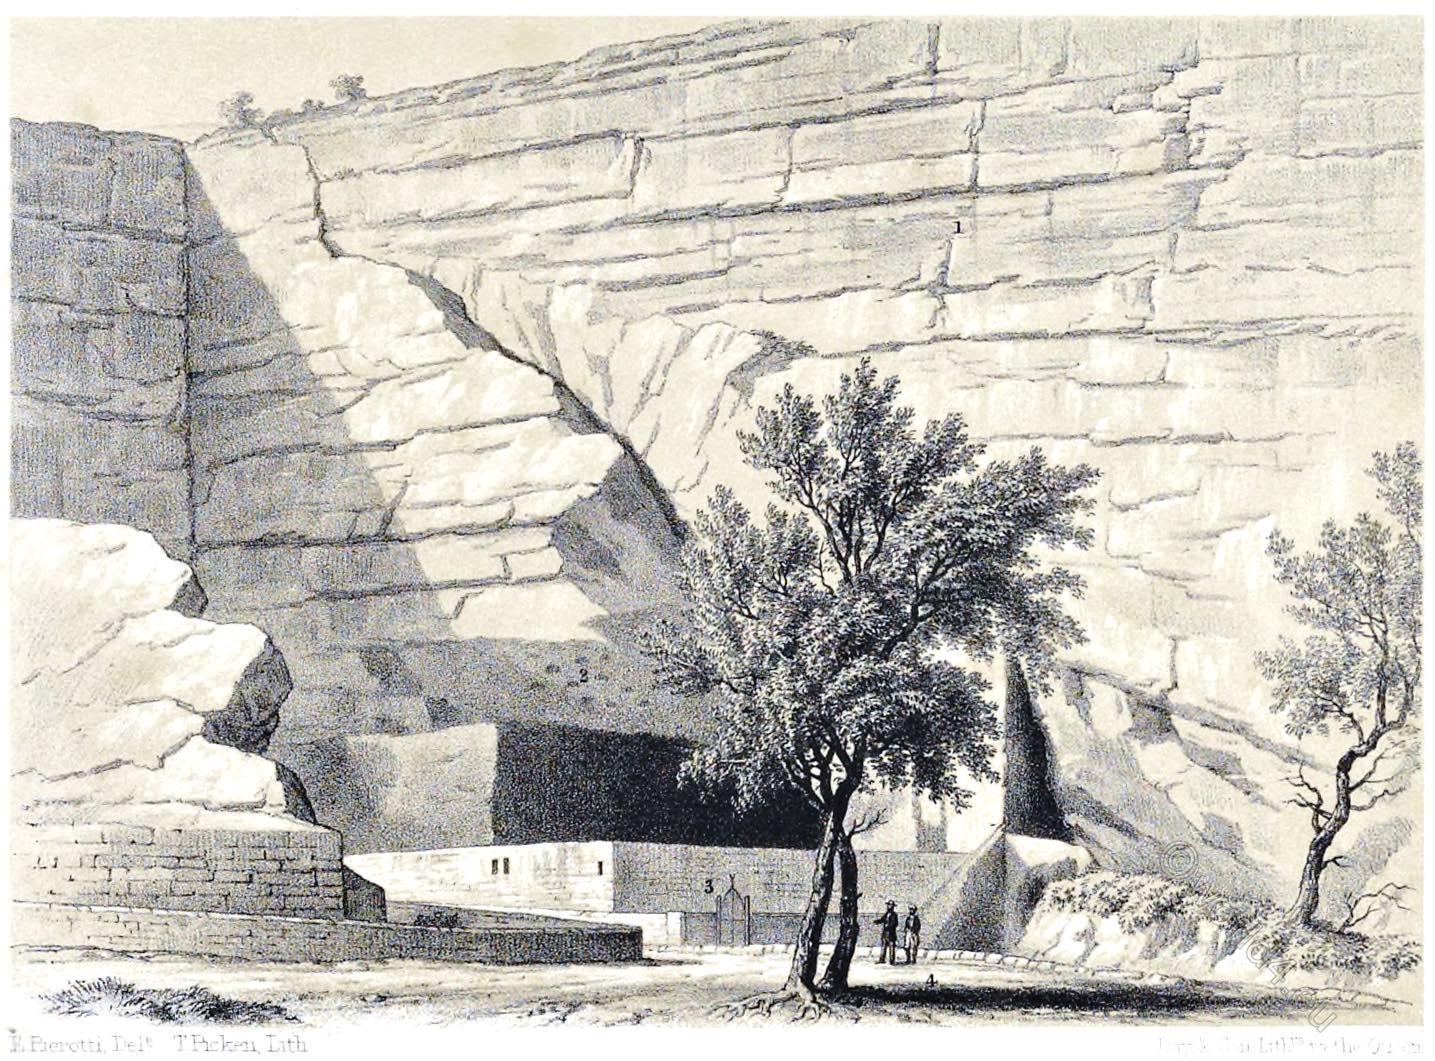 Jerusalem, Grotto, Jeremiah, Architecture, Holy, Land, Ermete Pierotti,